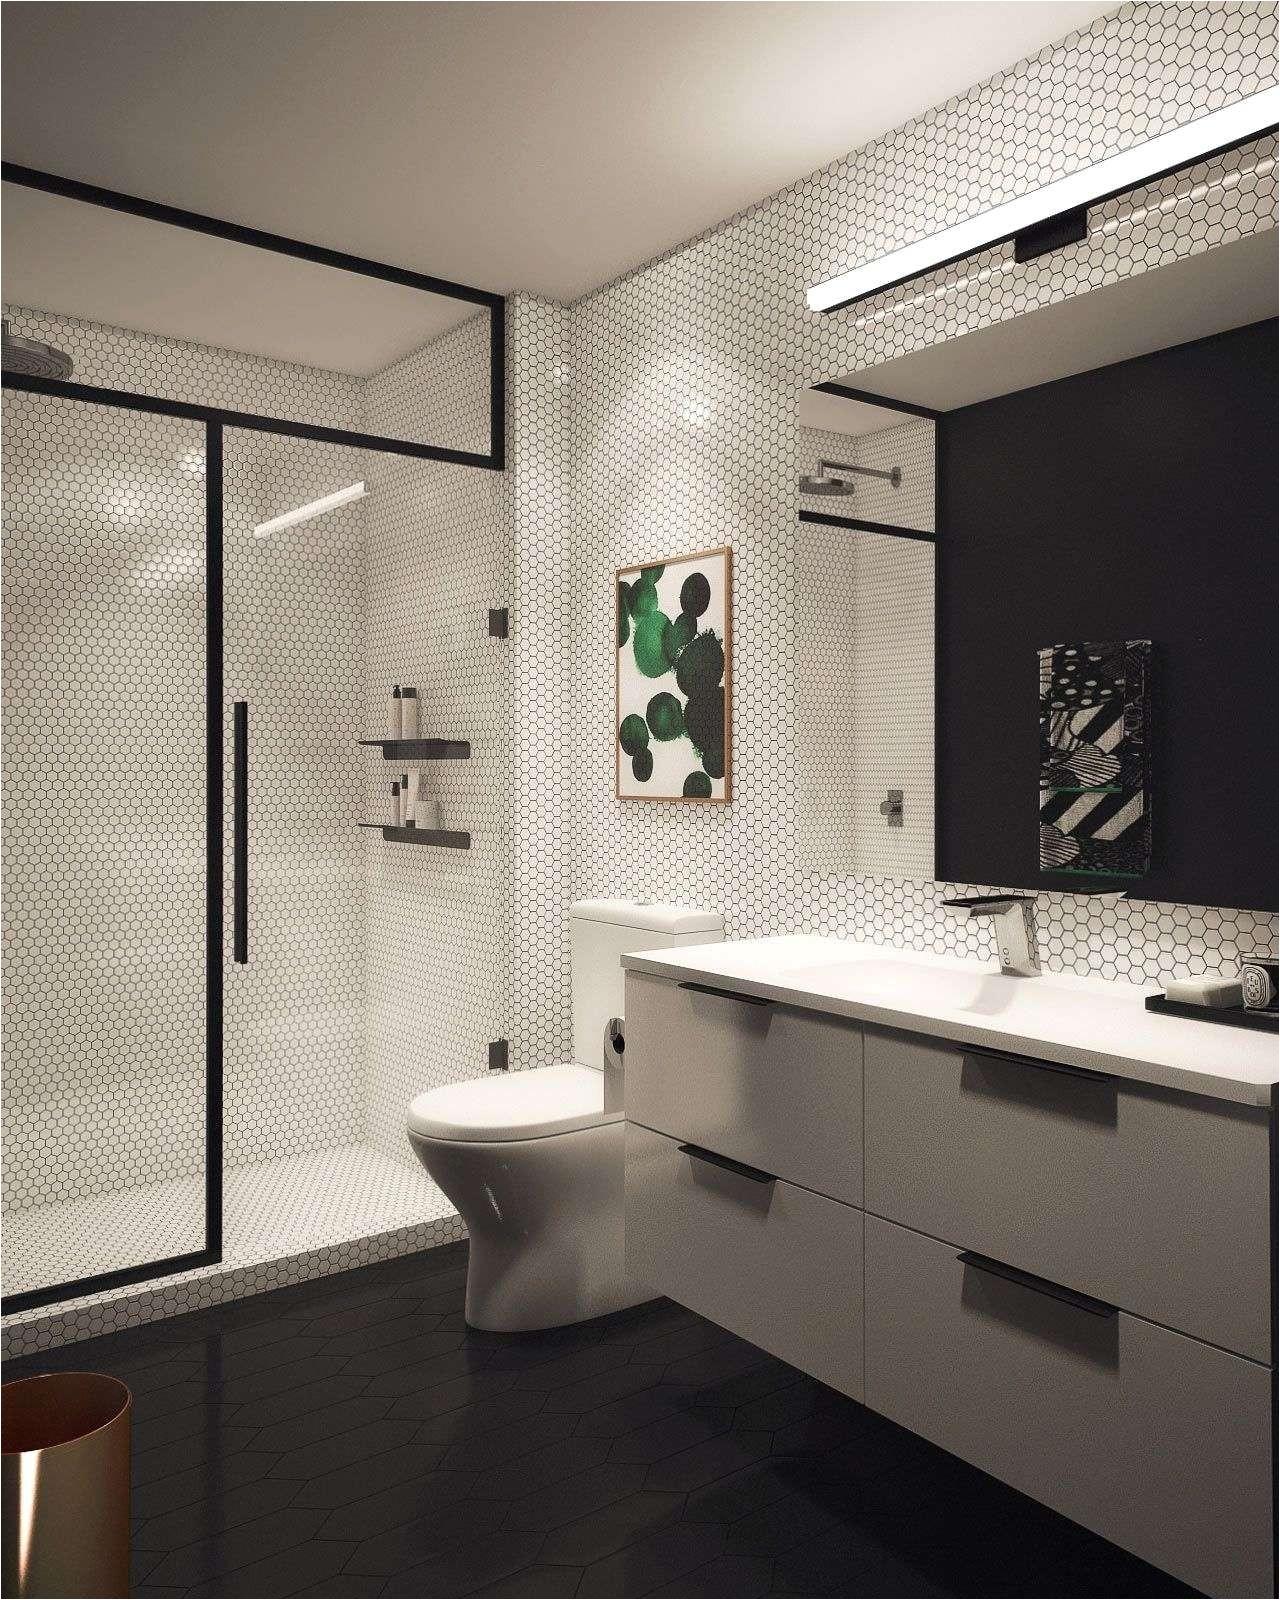 Small Full Bathroom Design Ideas Bathroom Design Ideas for Small Bathrooms Valid Lovely Small